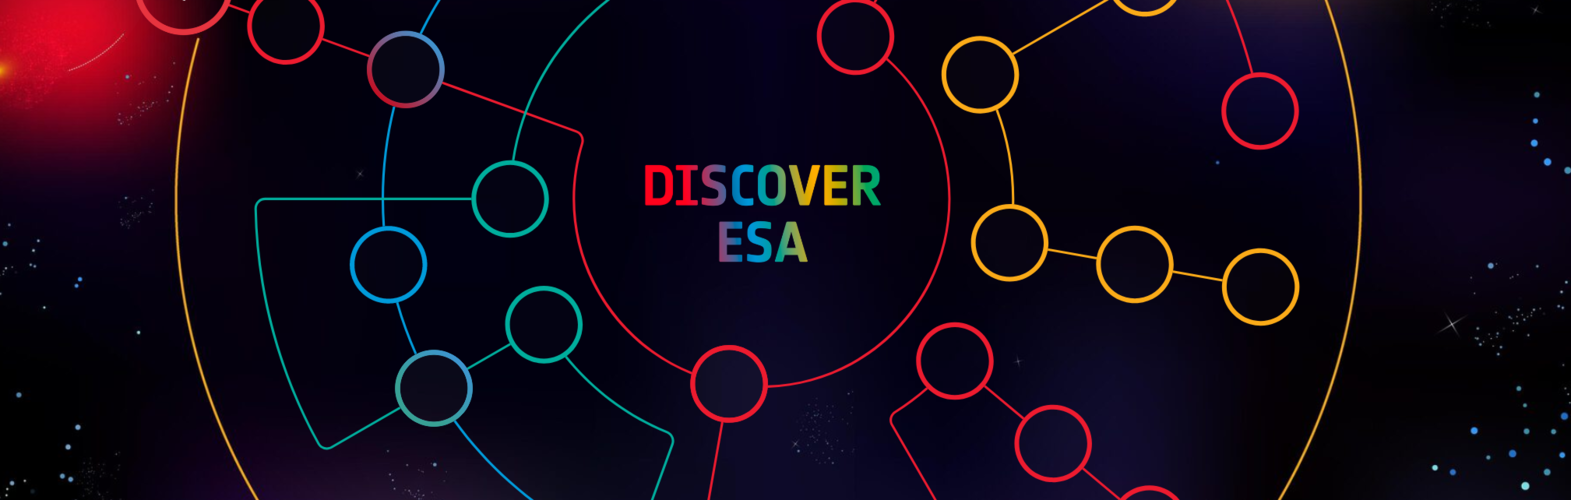 Visit ESA virtually with new Discover ESA platform